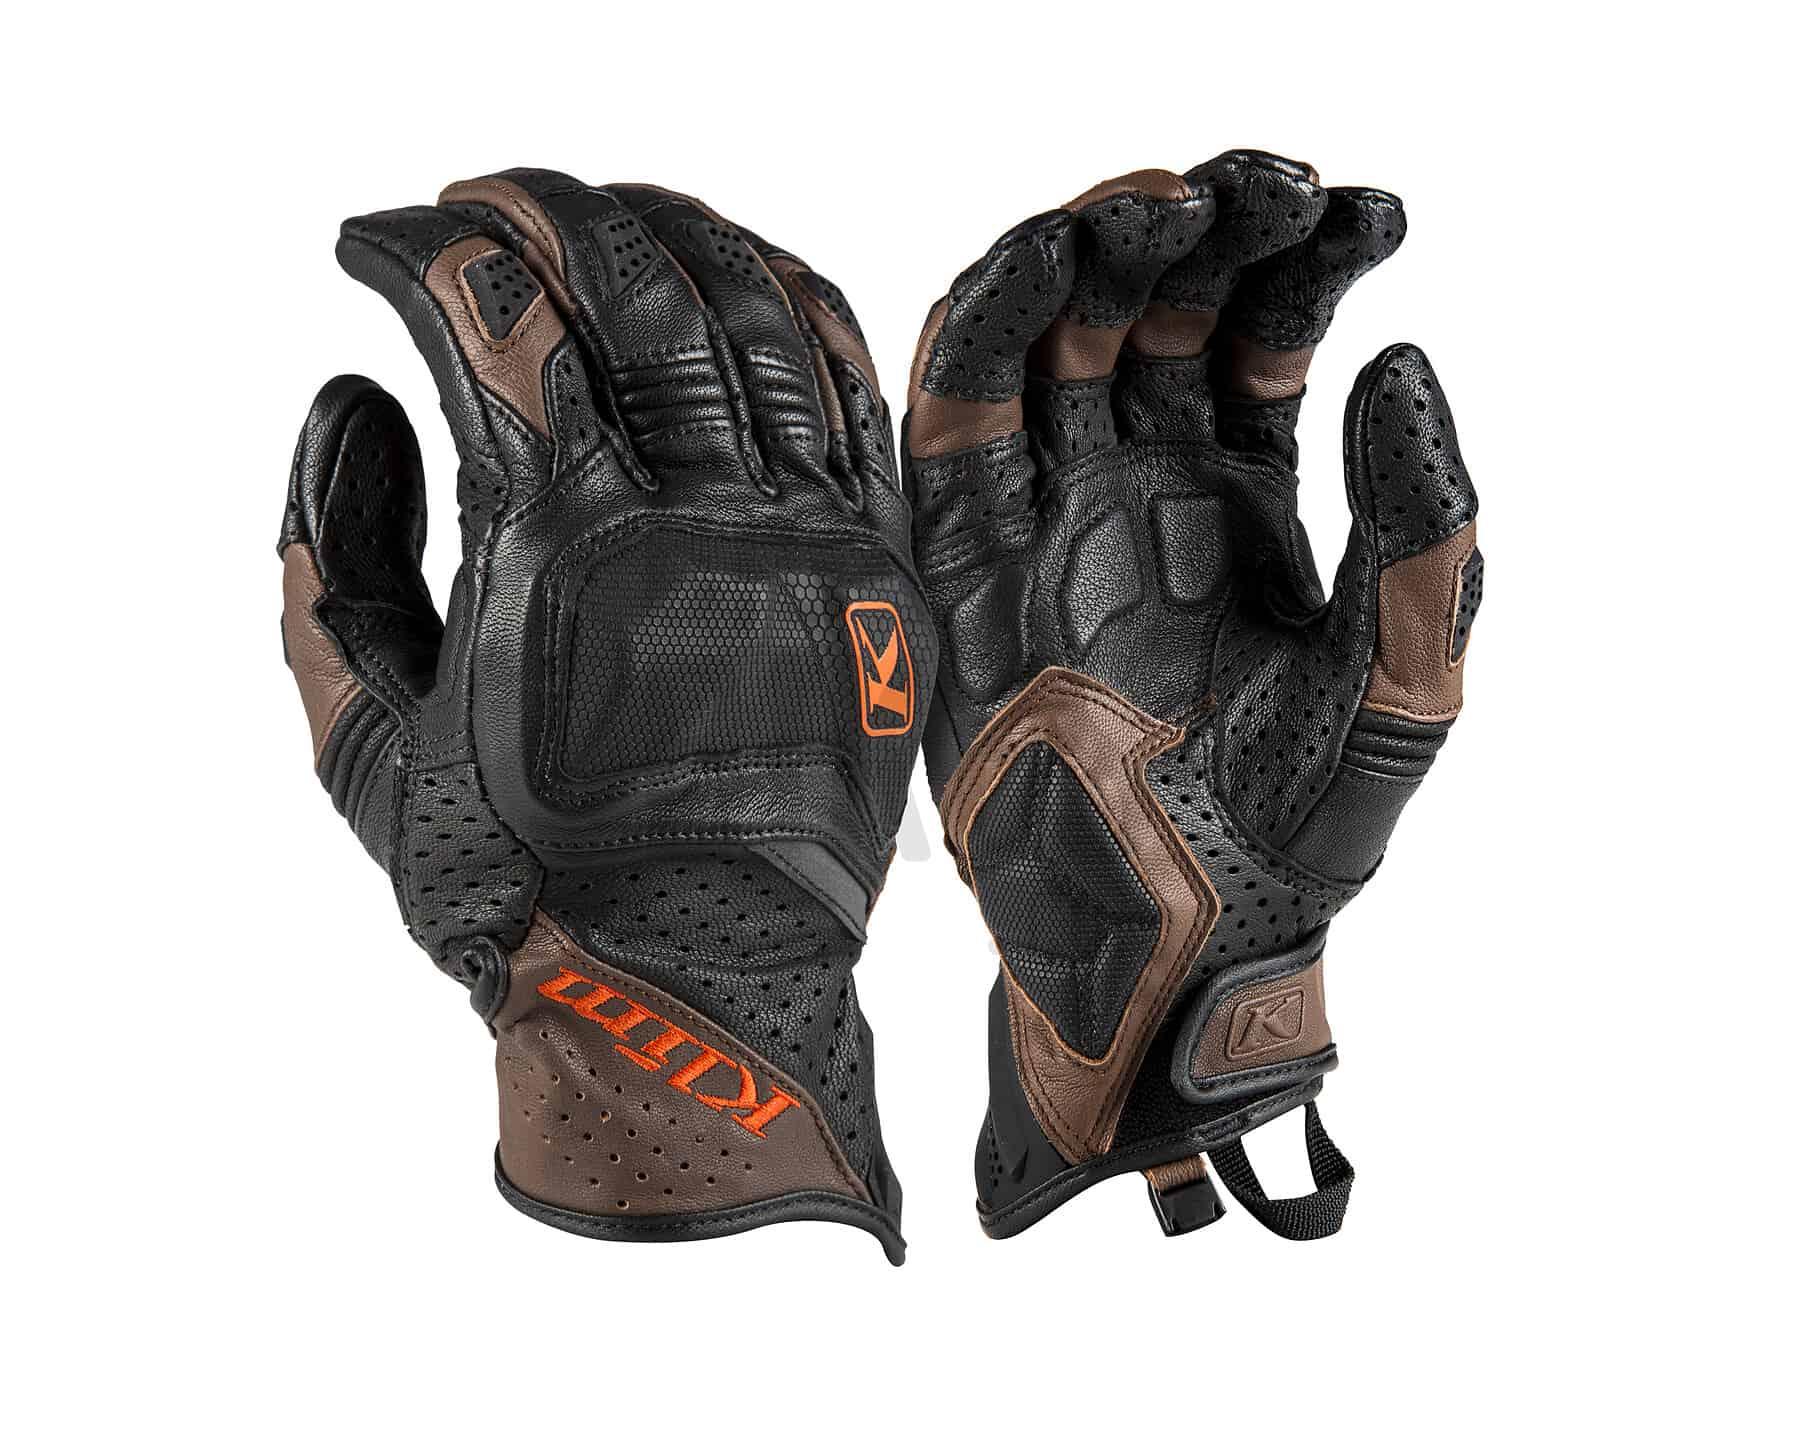 Badlands Aero Pro Short Glove_3924-000_Brown_Secondary_02